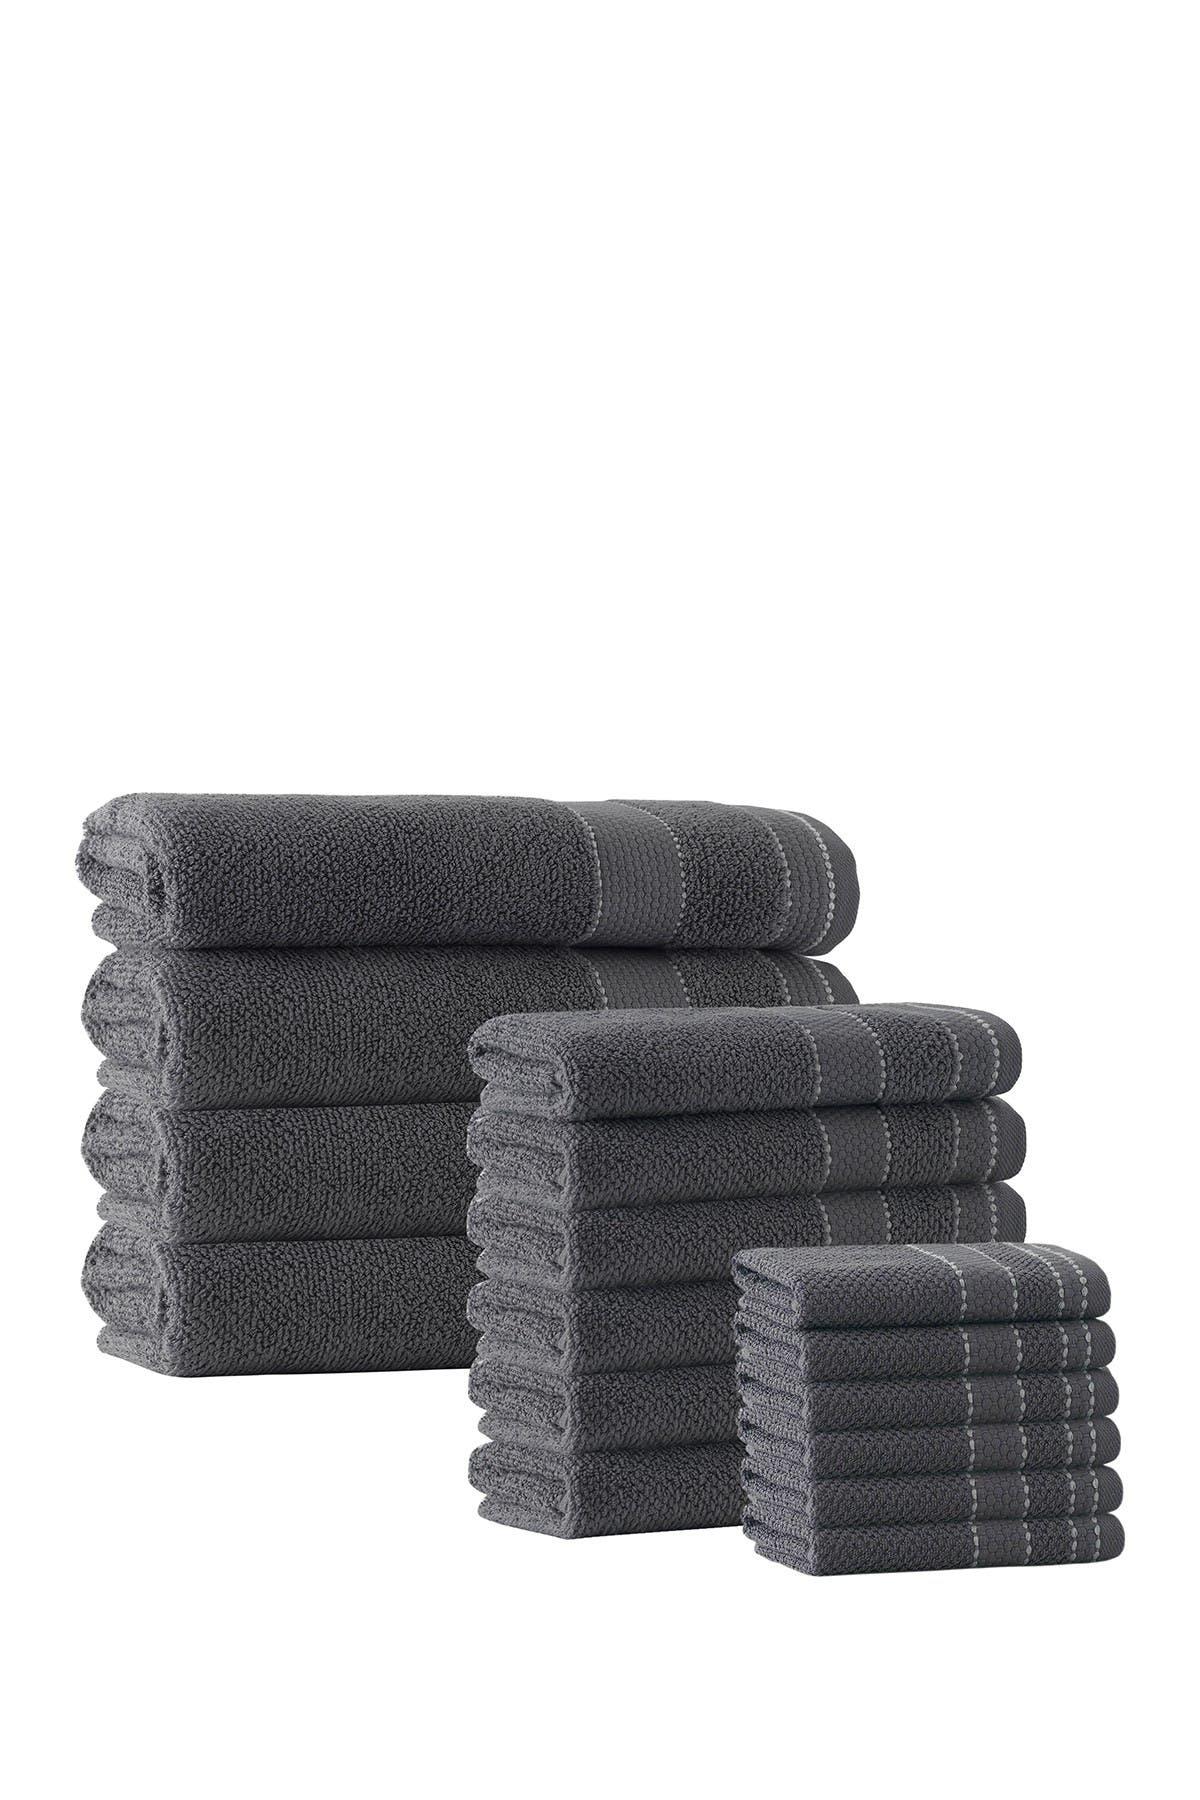 Image of ENCHANTE HOME Monroe Turkish Cotton 16-Piece Towel Set - Anthracite